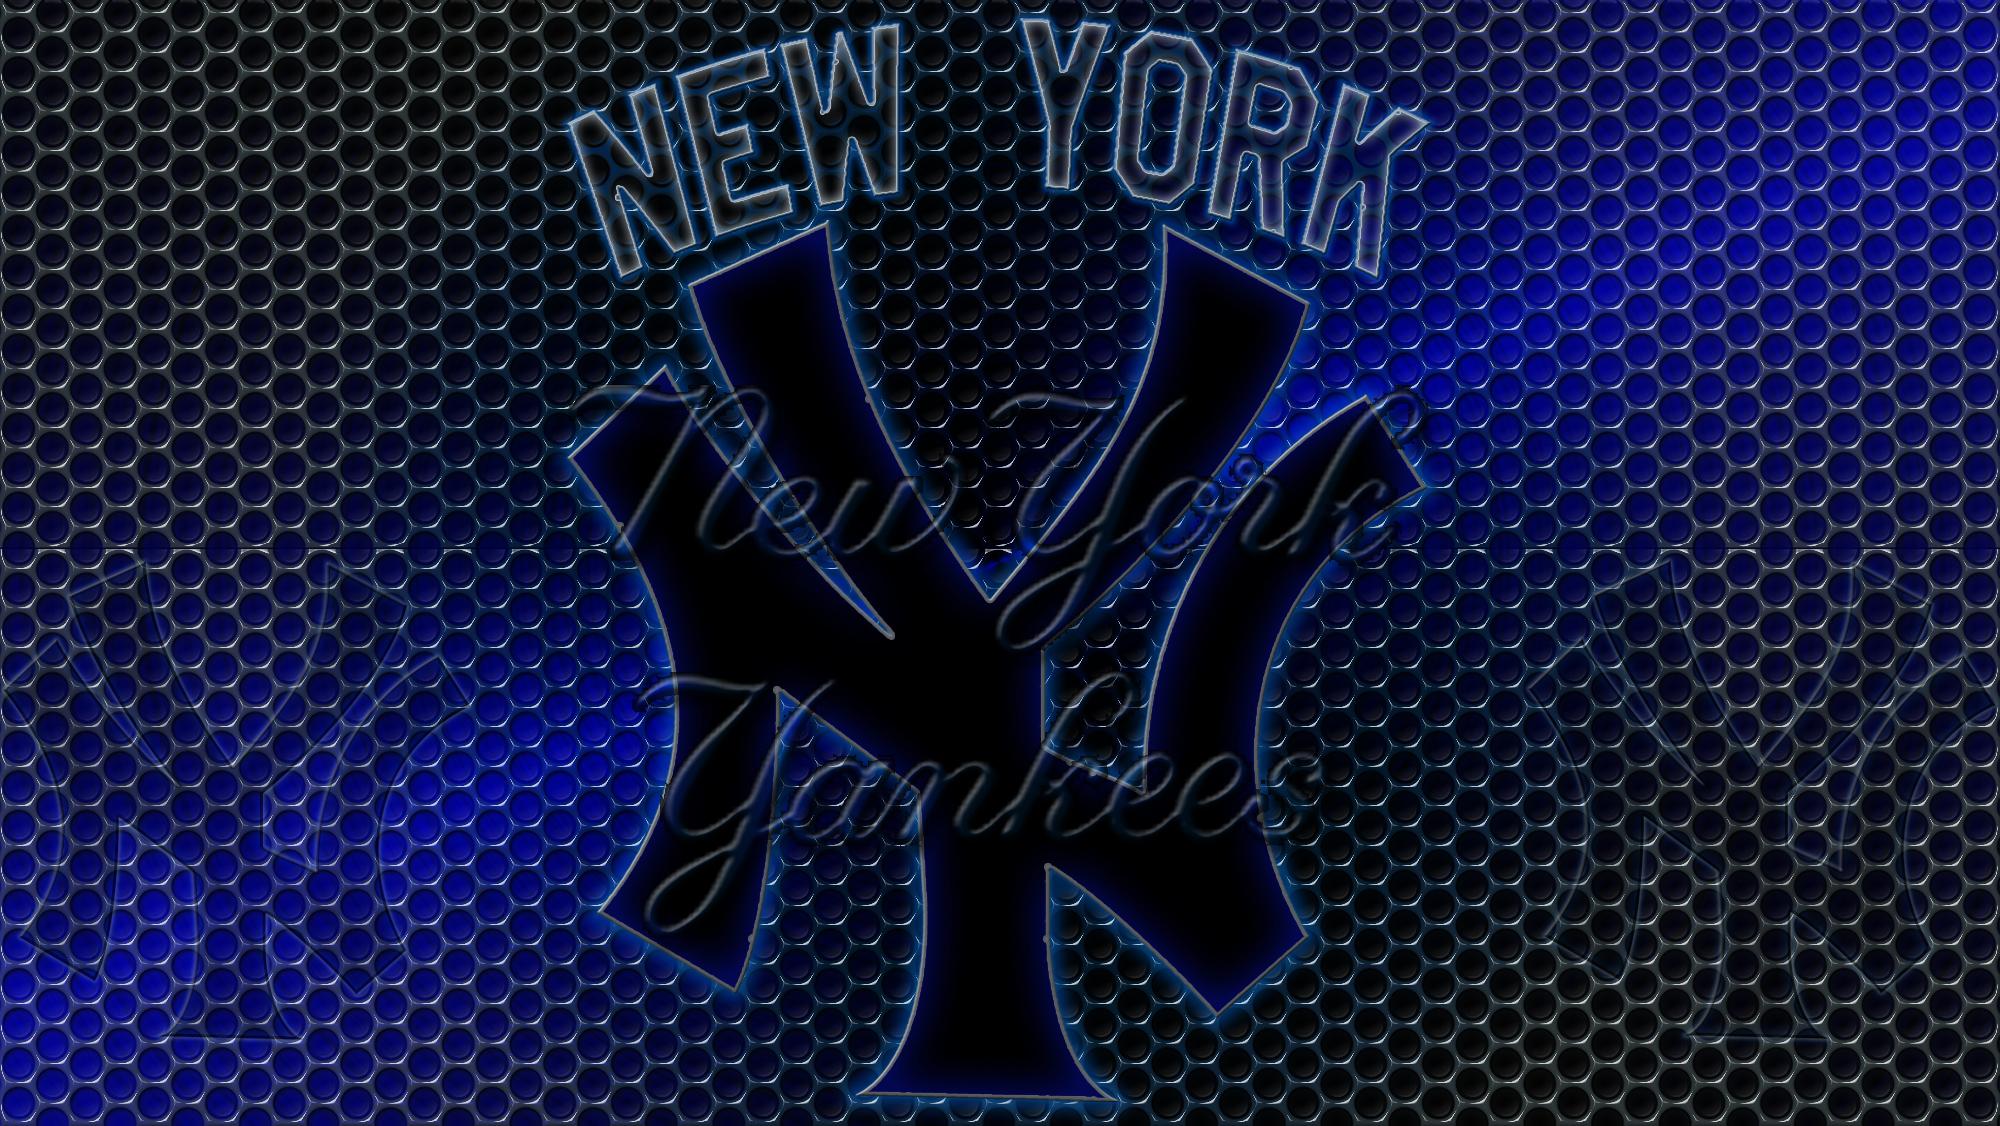 New York Yankees Logo Wallpaper New york yankees logo grid 2000x1126